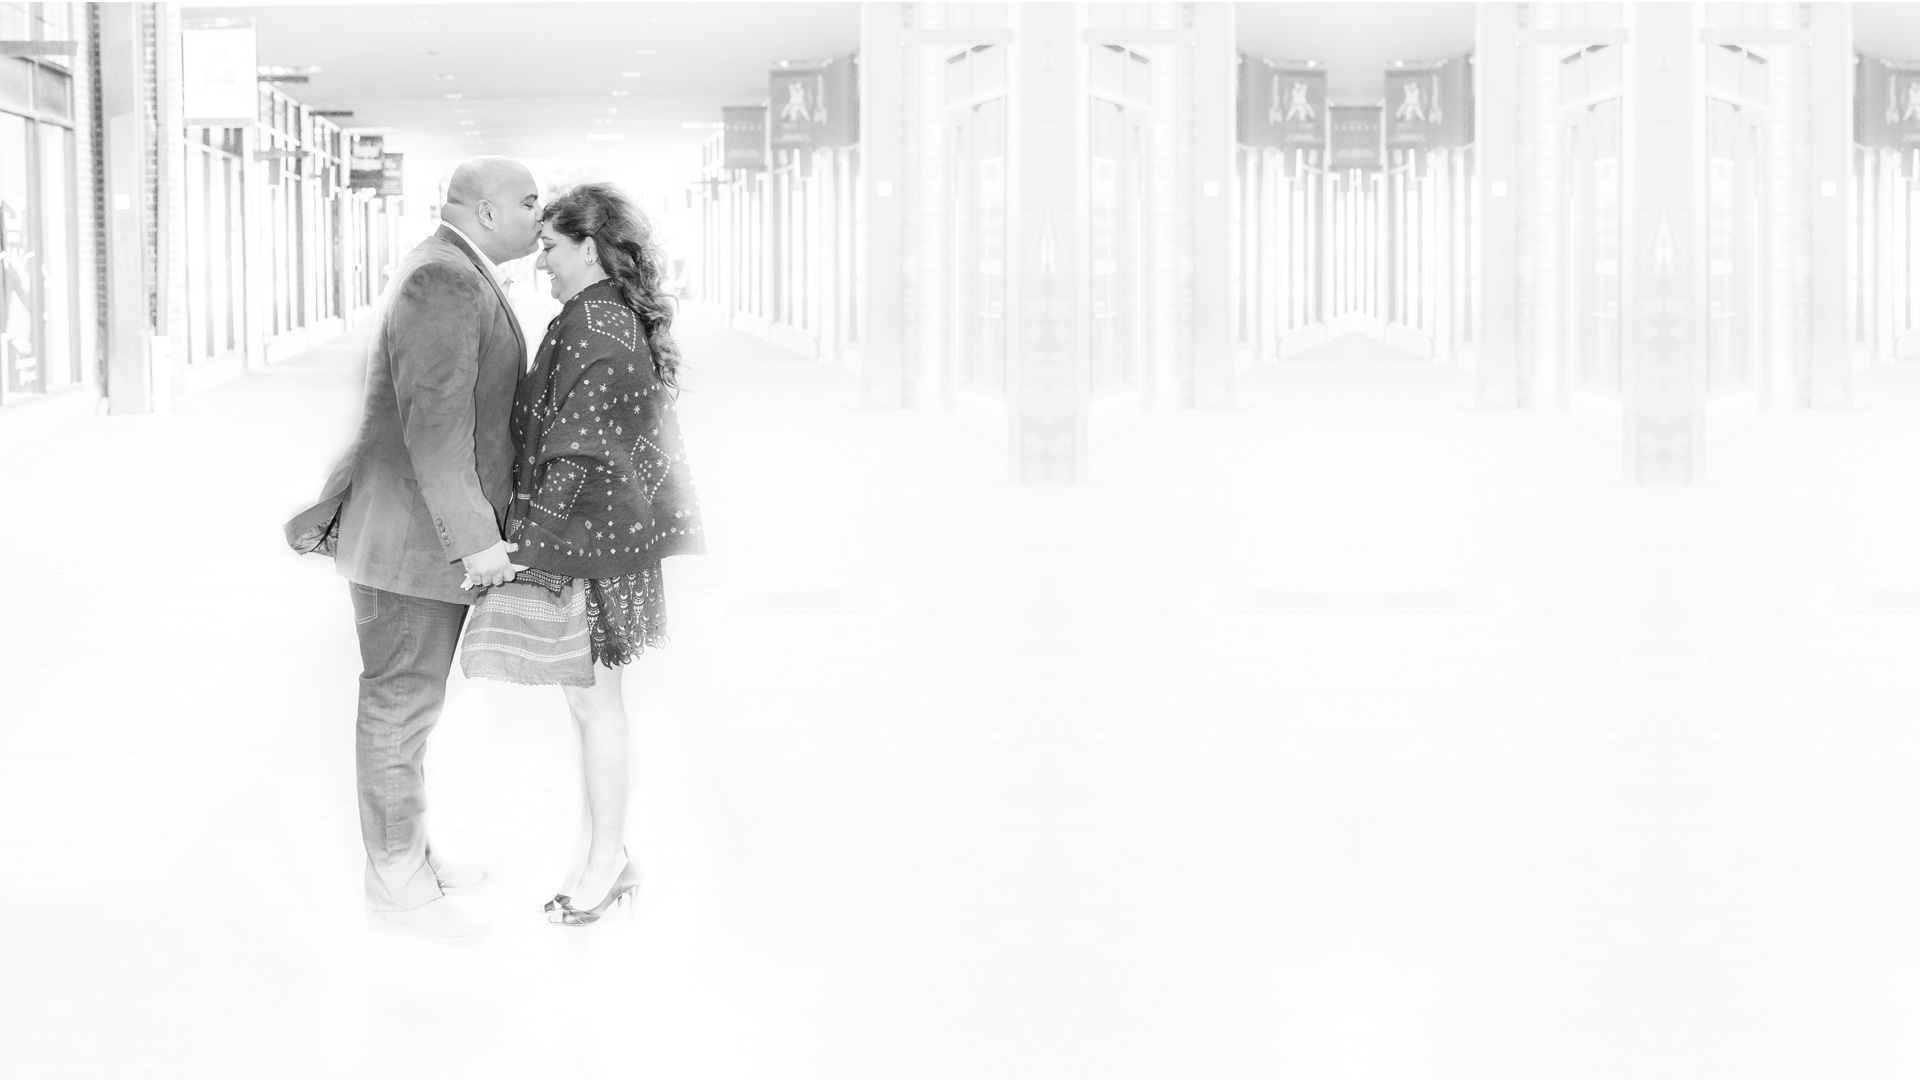 epicskypictures_eshoot_photography_wedding_photoshoot_gettingmarried_brampton_love_at_first_sight_indian_passion_groom_bridetobe_blackandwhite_thisisepic_toronto_ontario_site